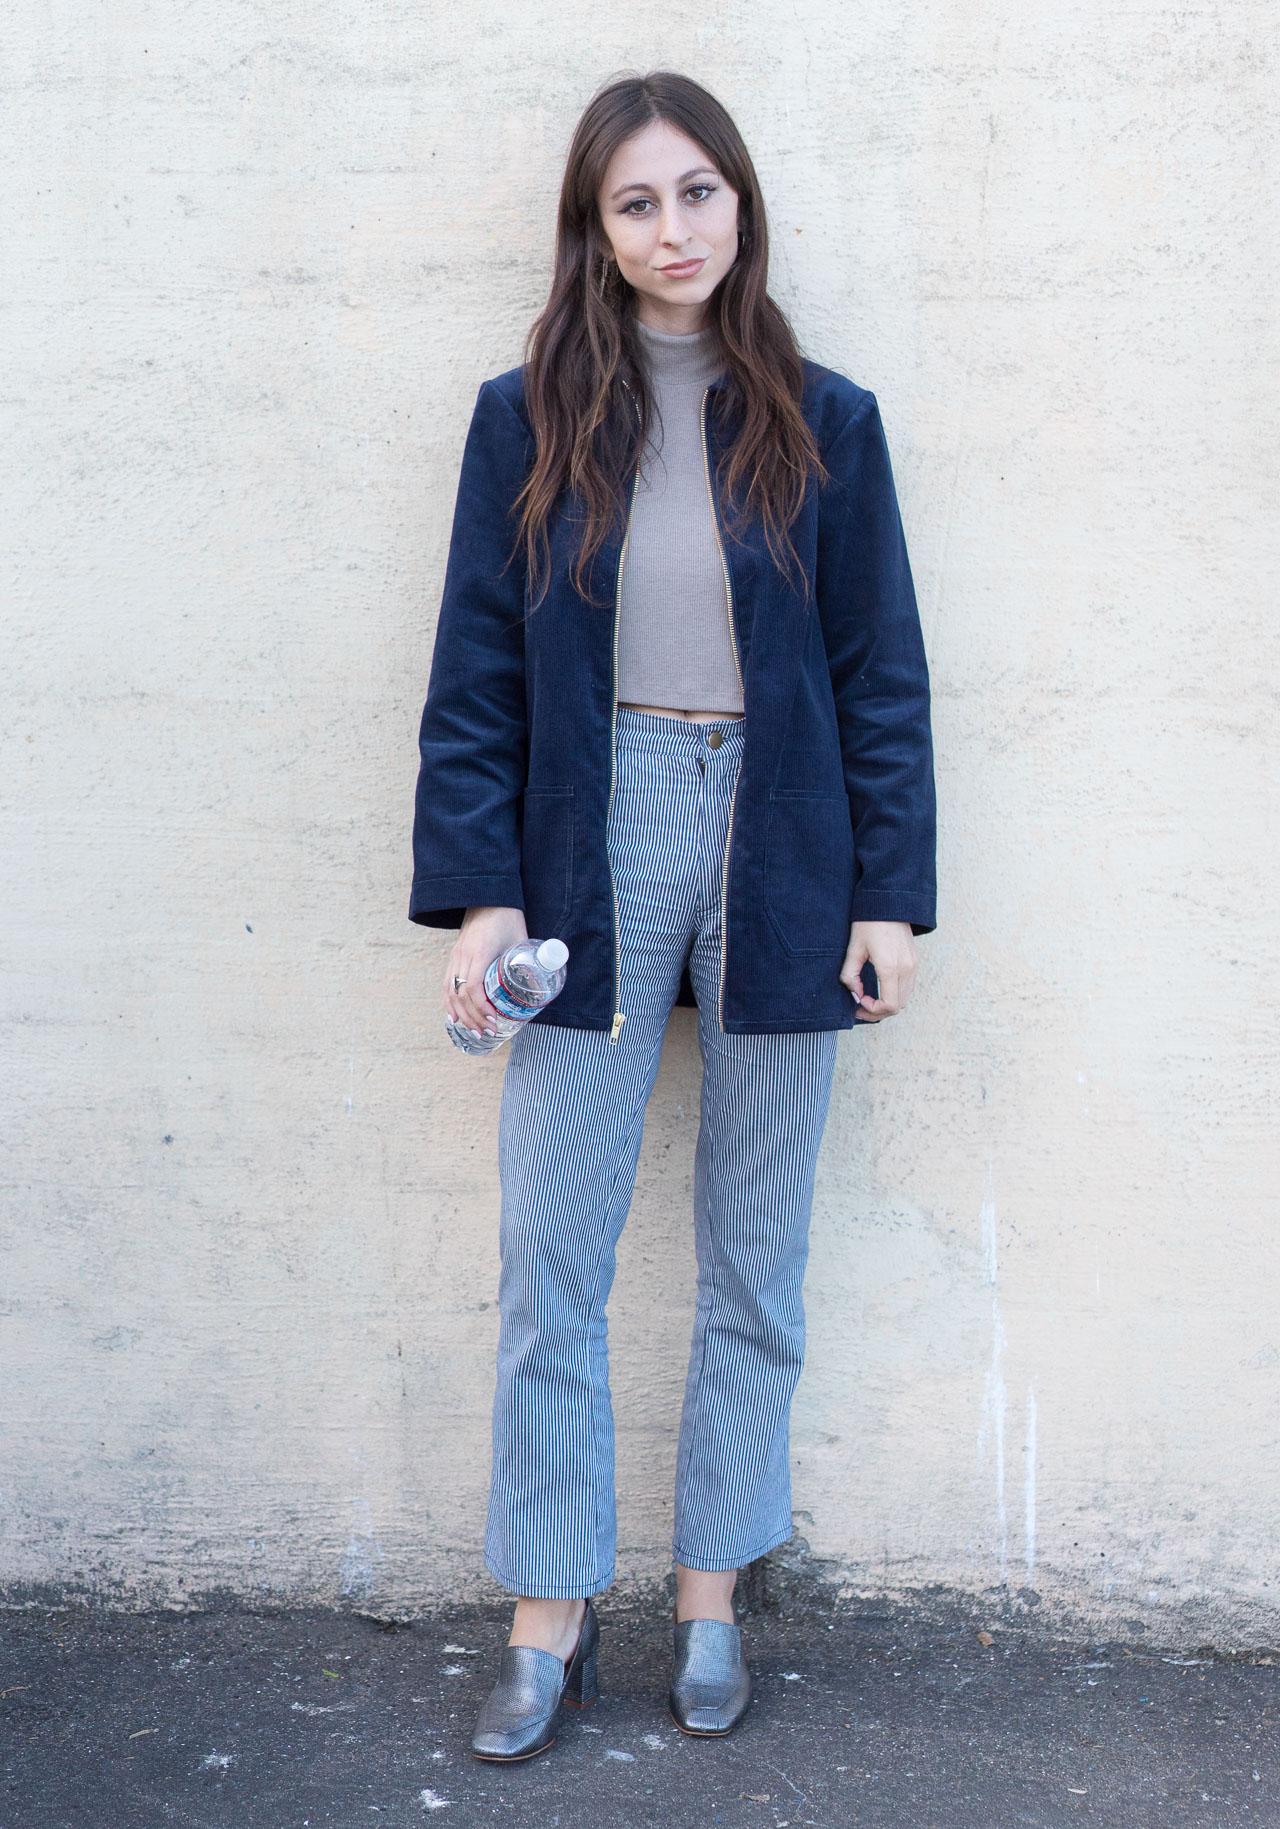 janae-sf-looks